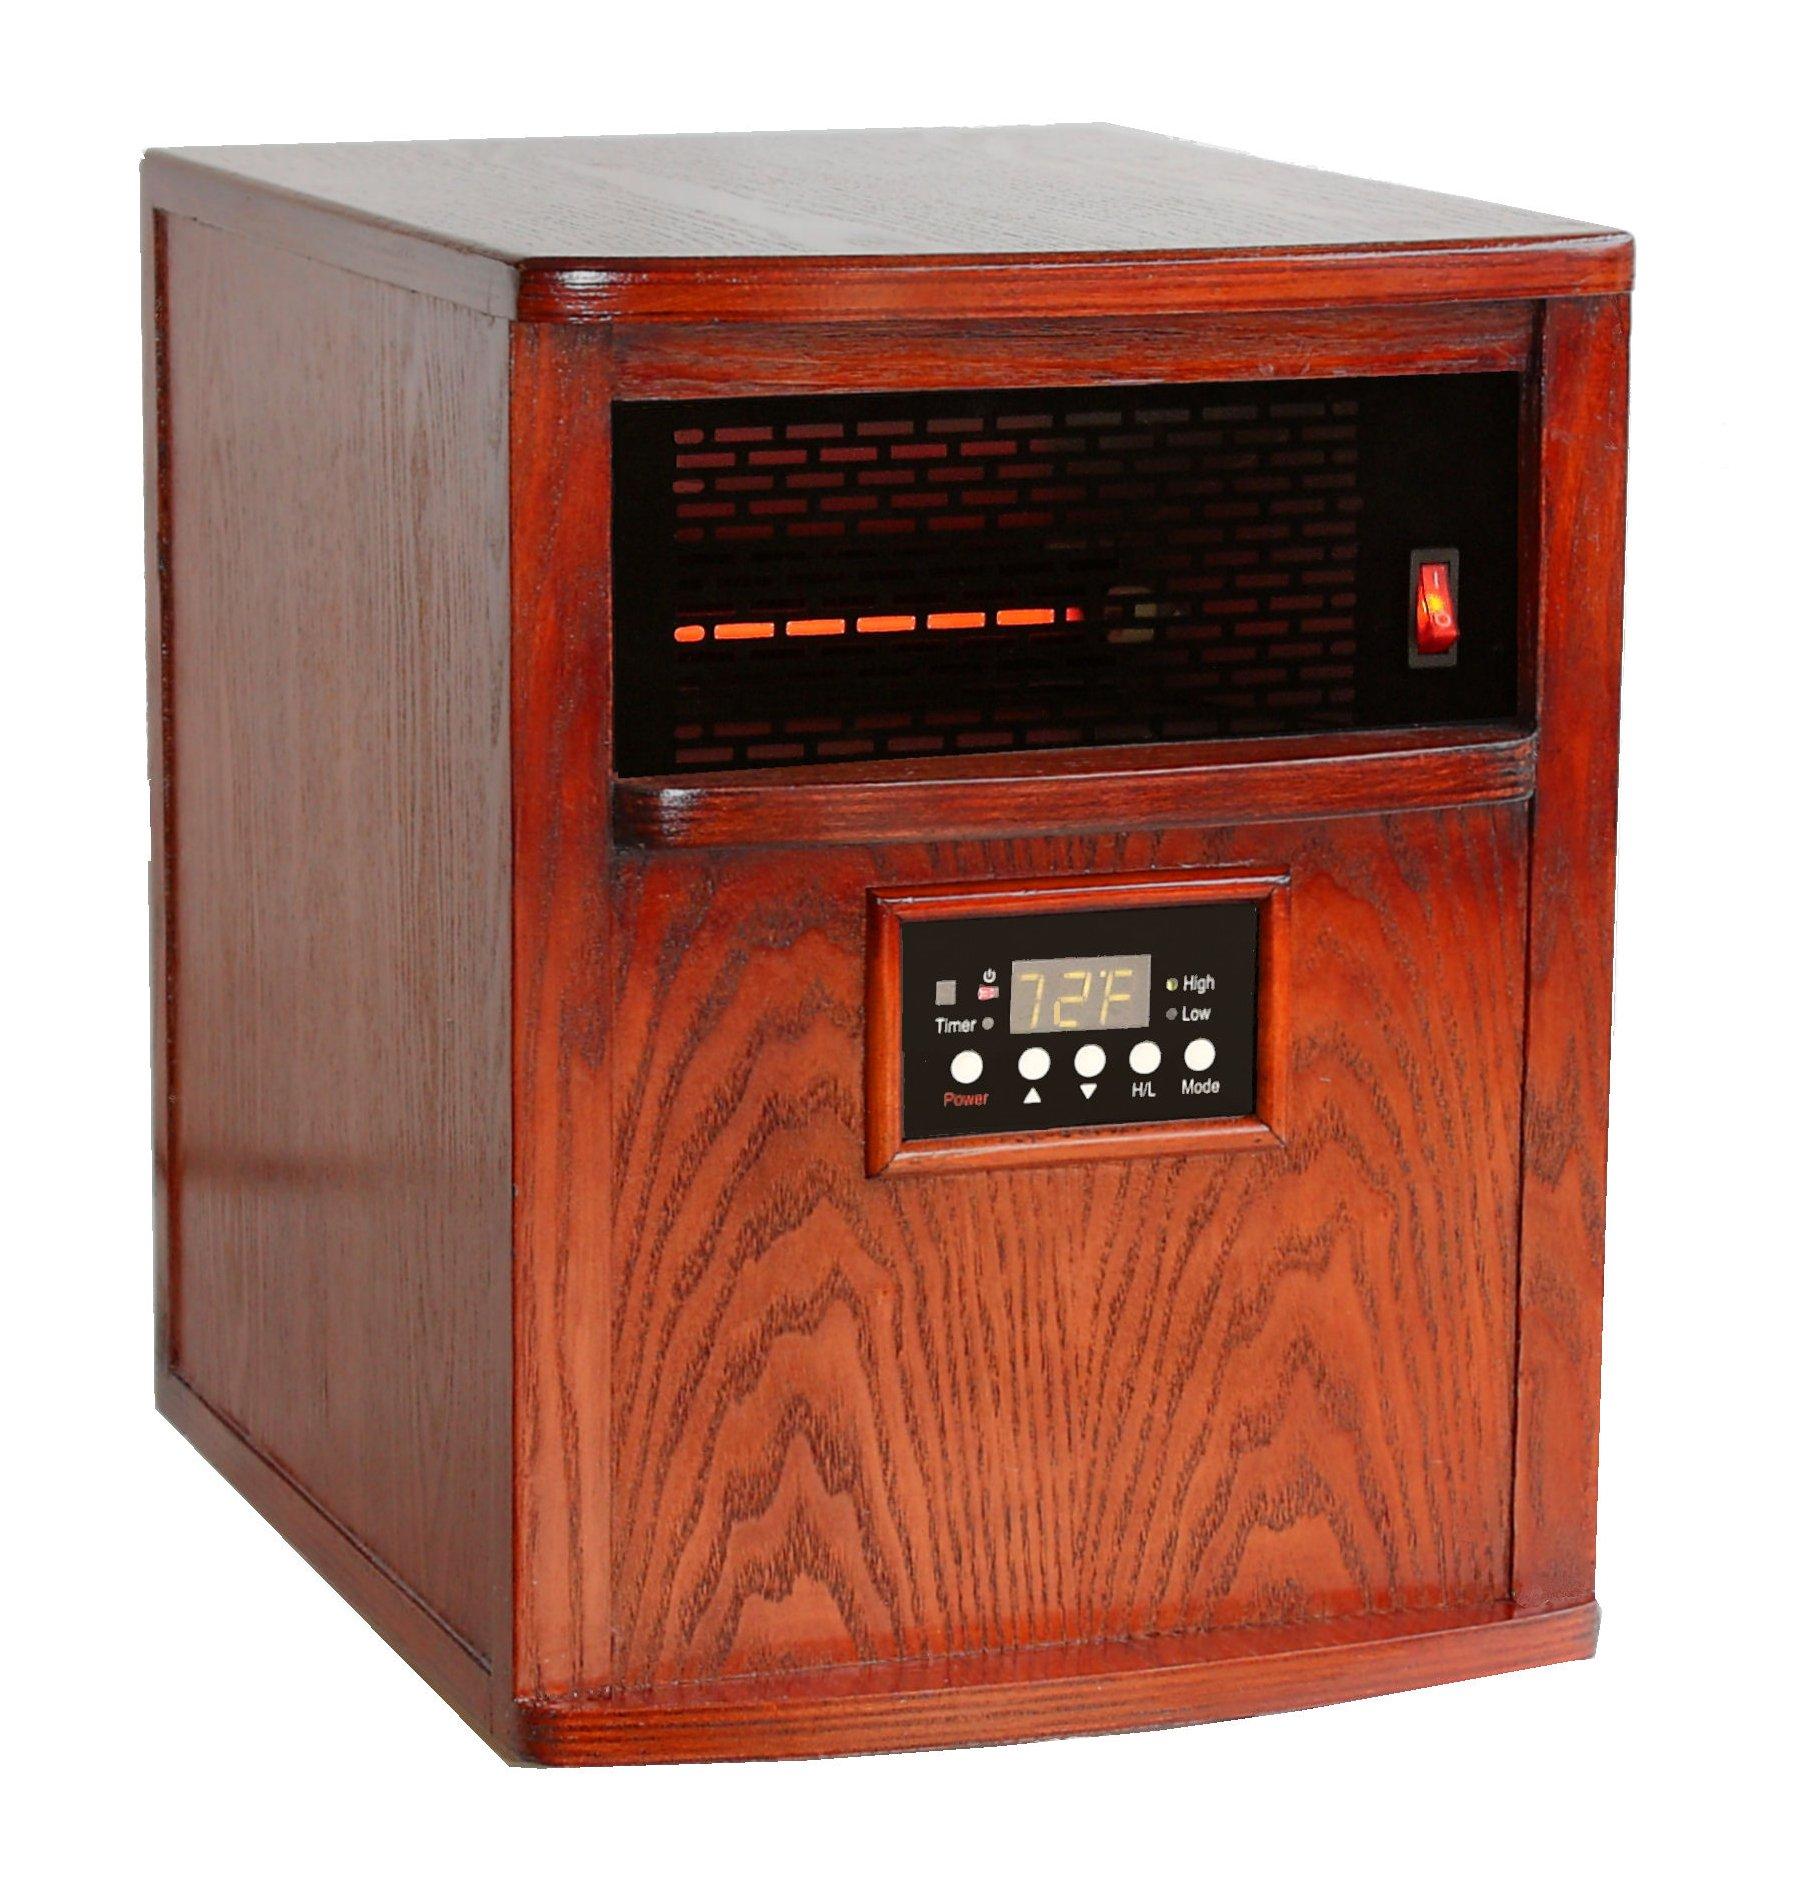 Heat Smart LT1500-NSN-KH Liberty Quartz Infrared Heater, Oak